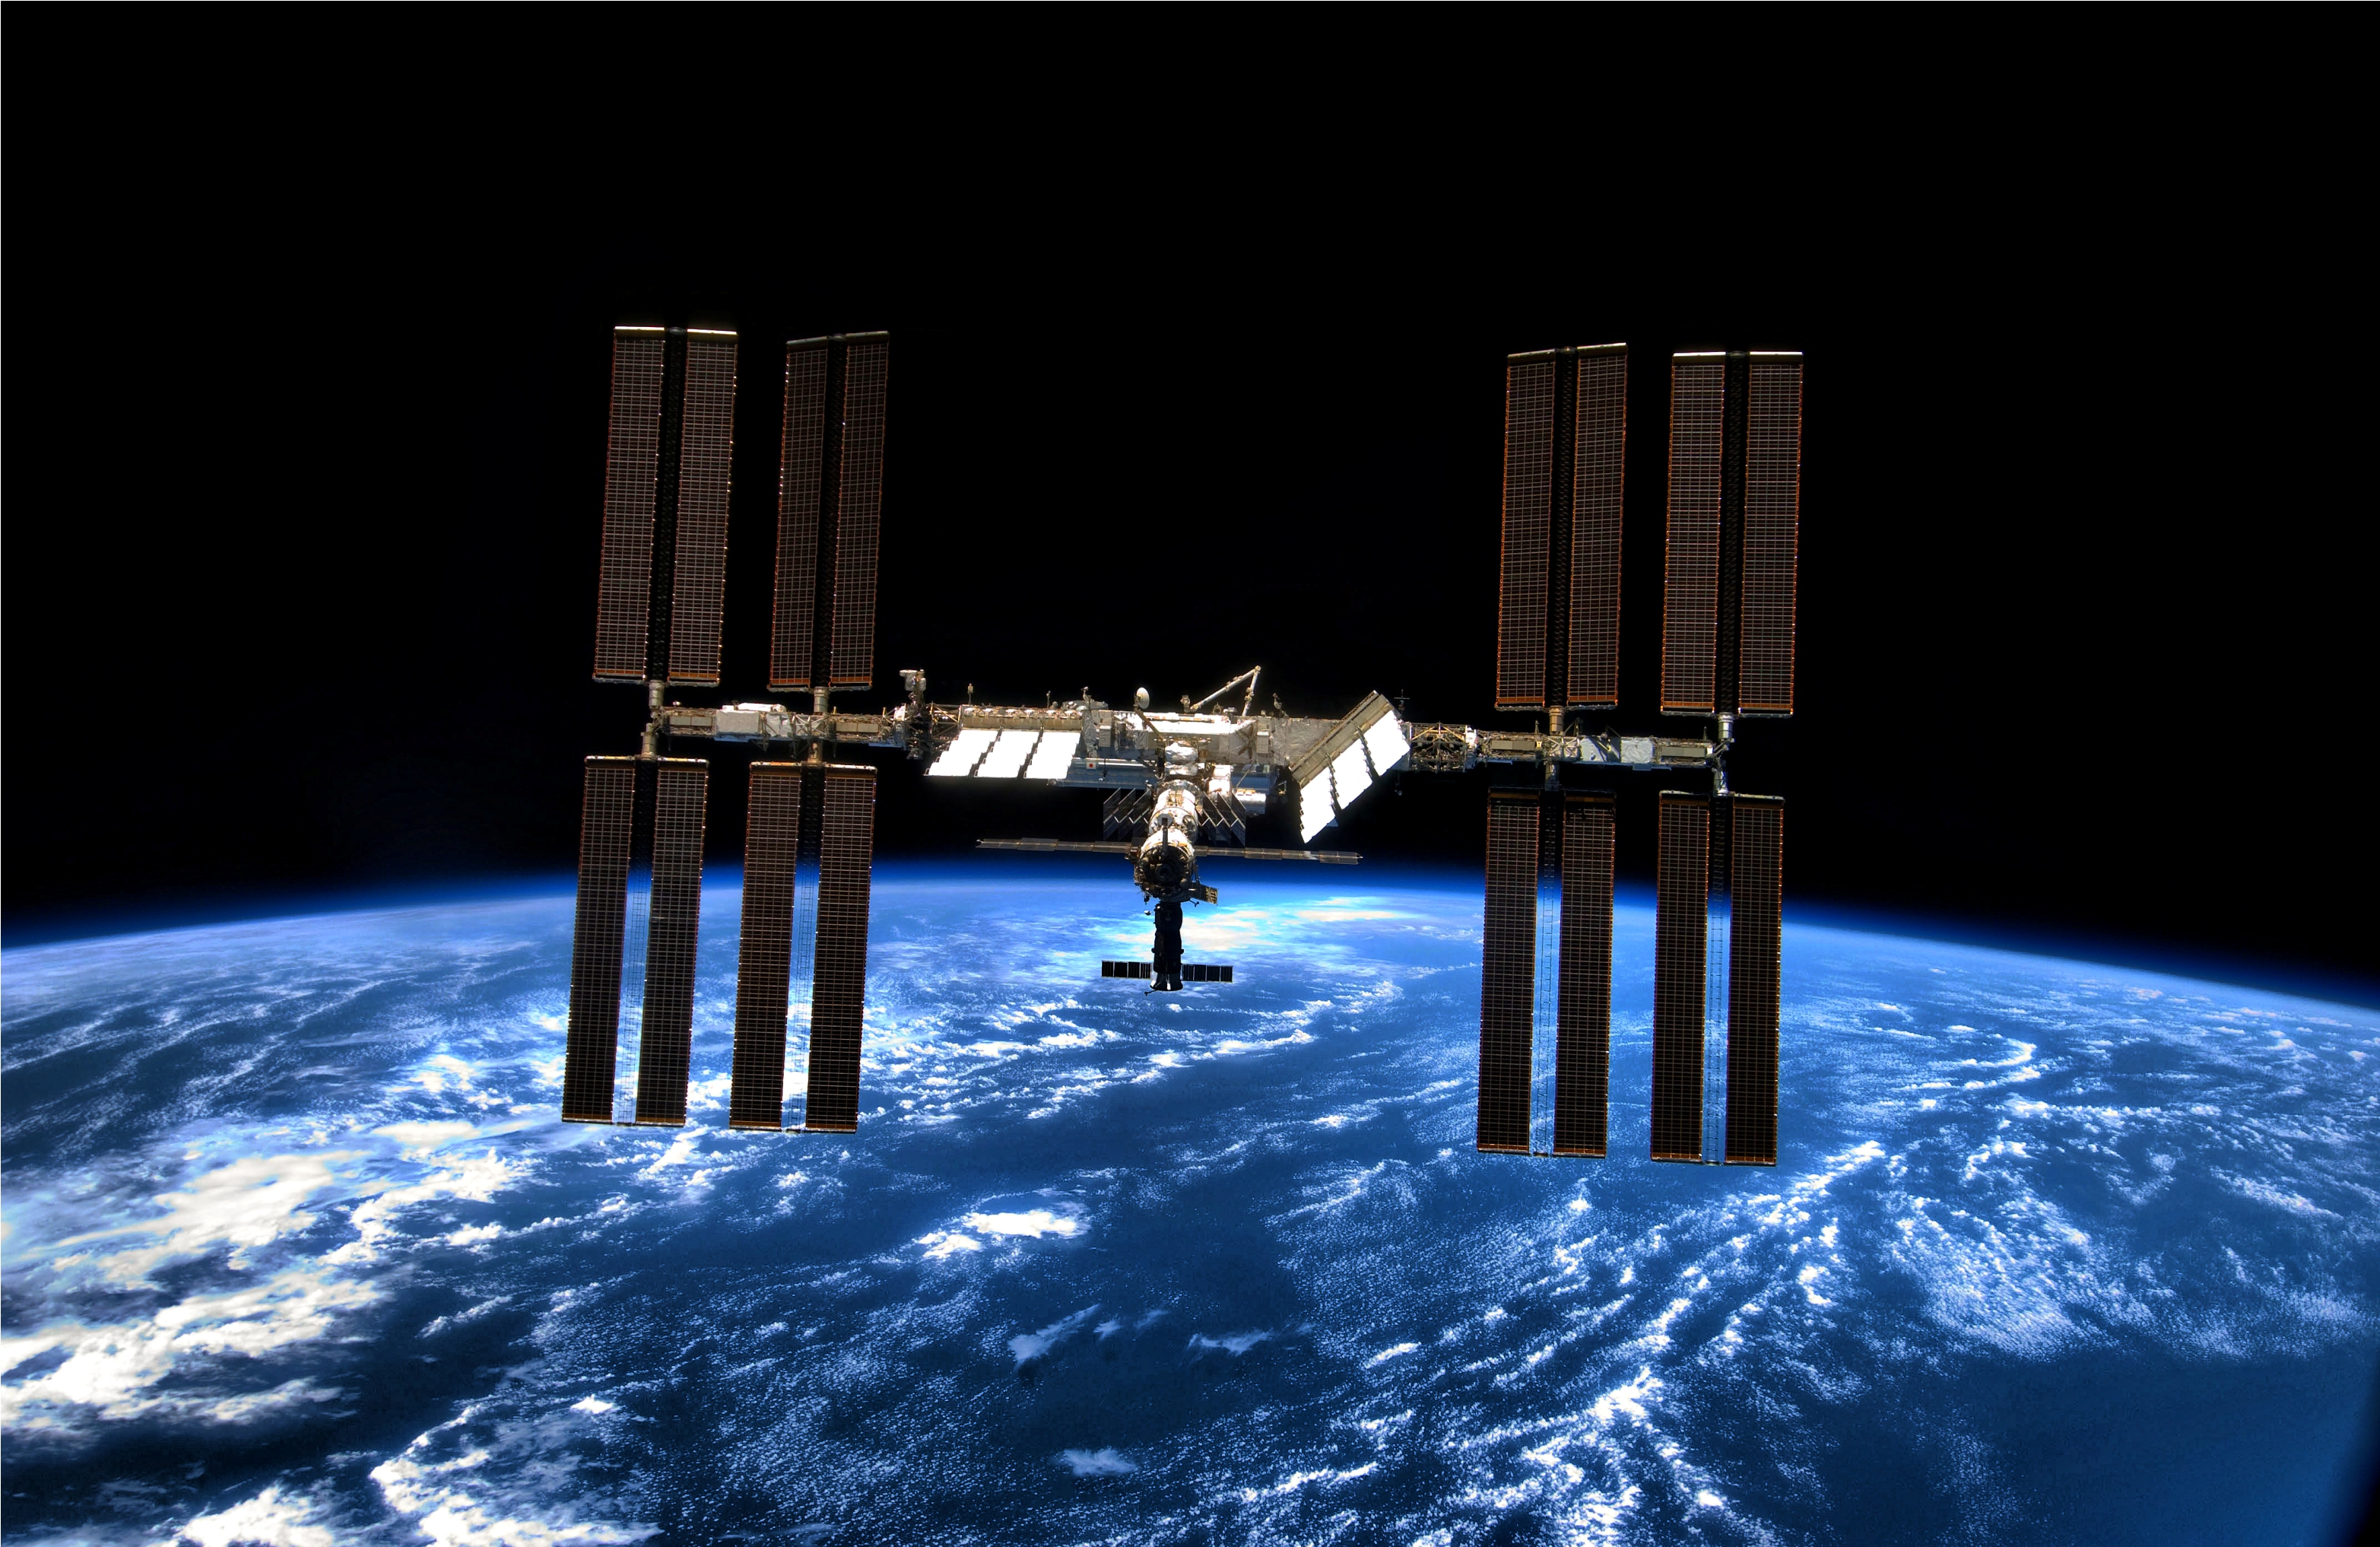 Space Images Wallpaper NASA Jet Propulsion Laboratory